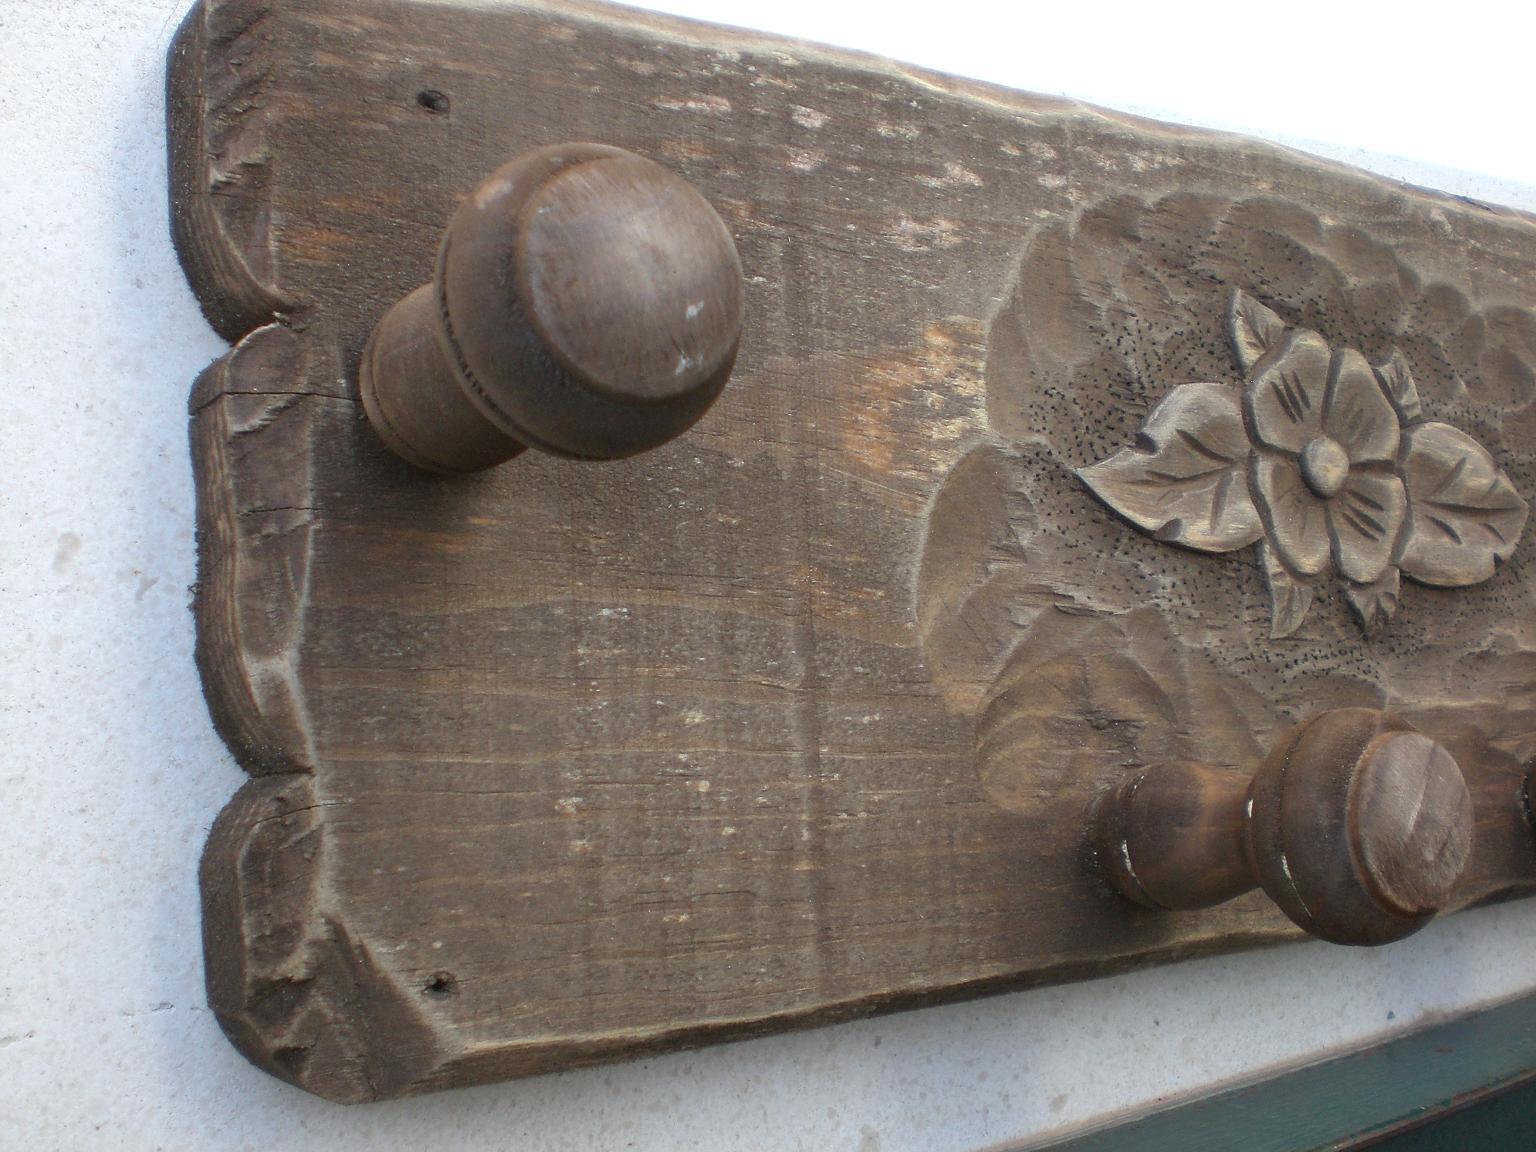 Artesan a r stica en madera perchero rustico tallado a for Colgadores de madera